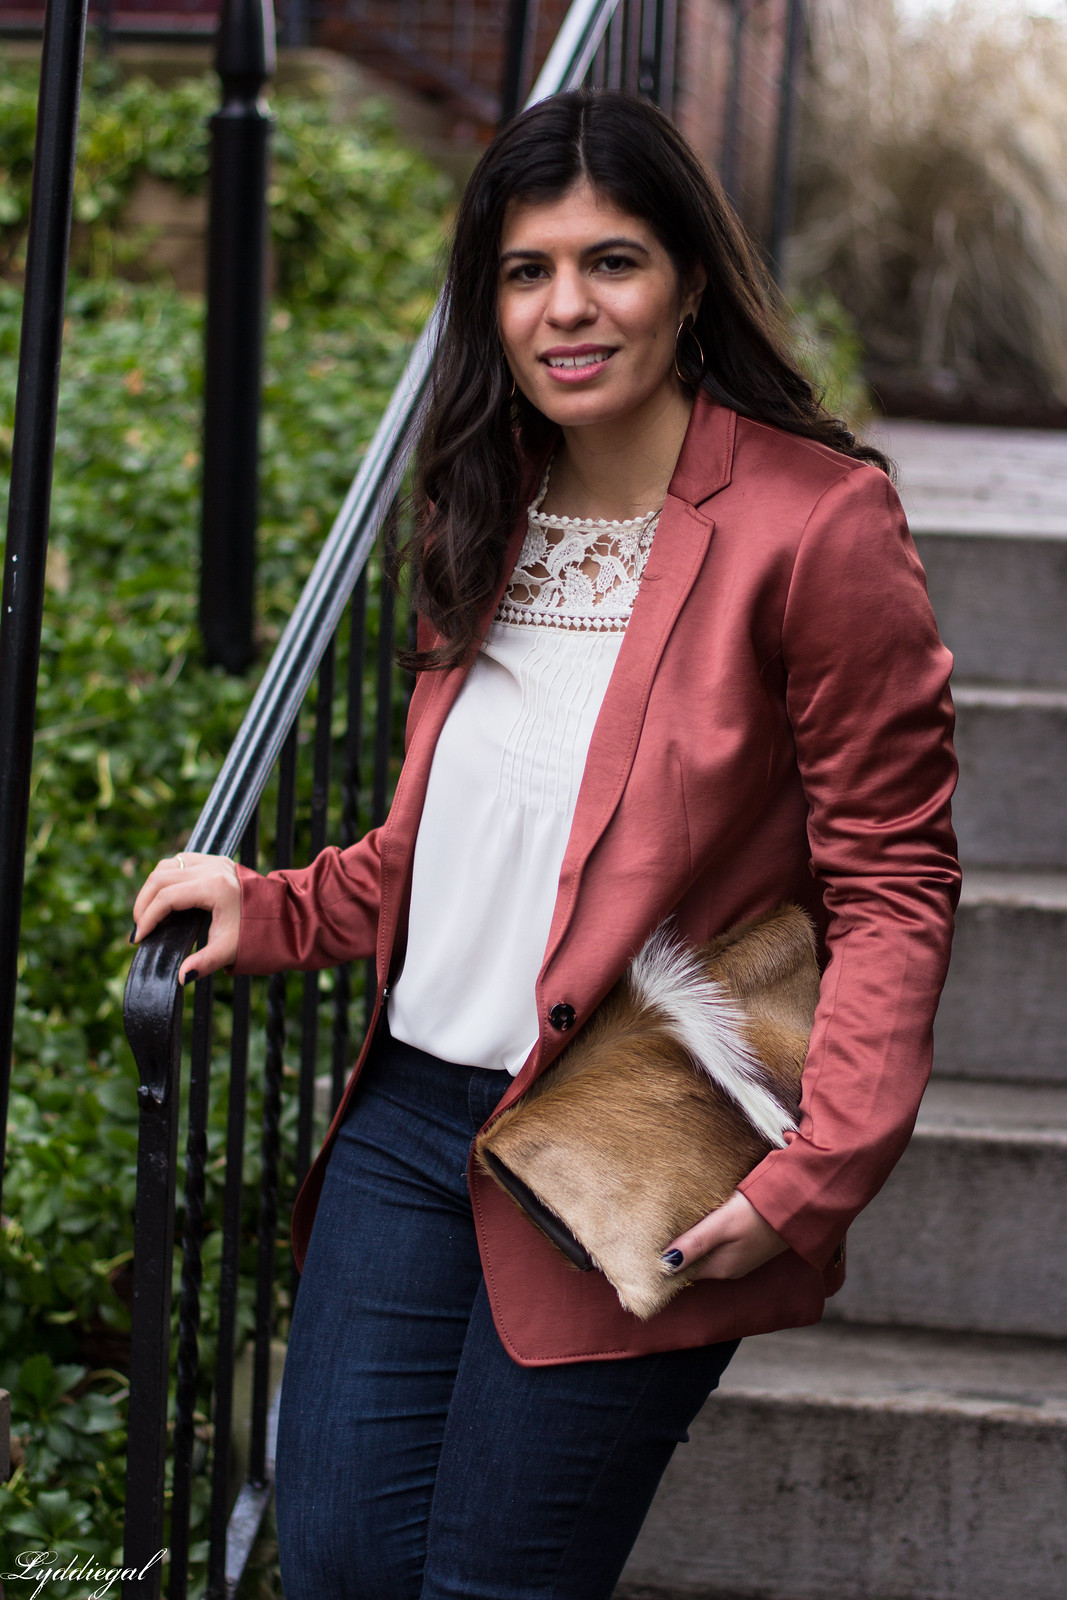 rust silk boyfriend blazer, springbok clutch, lace blouse-13.jpg